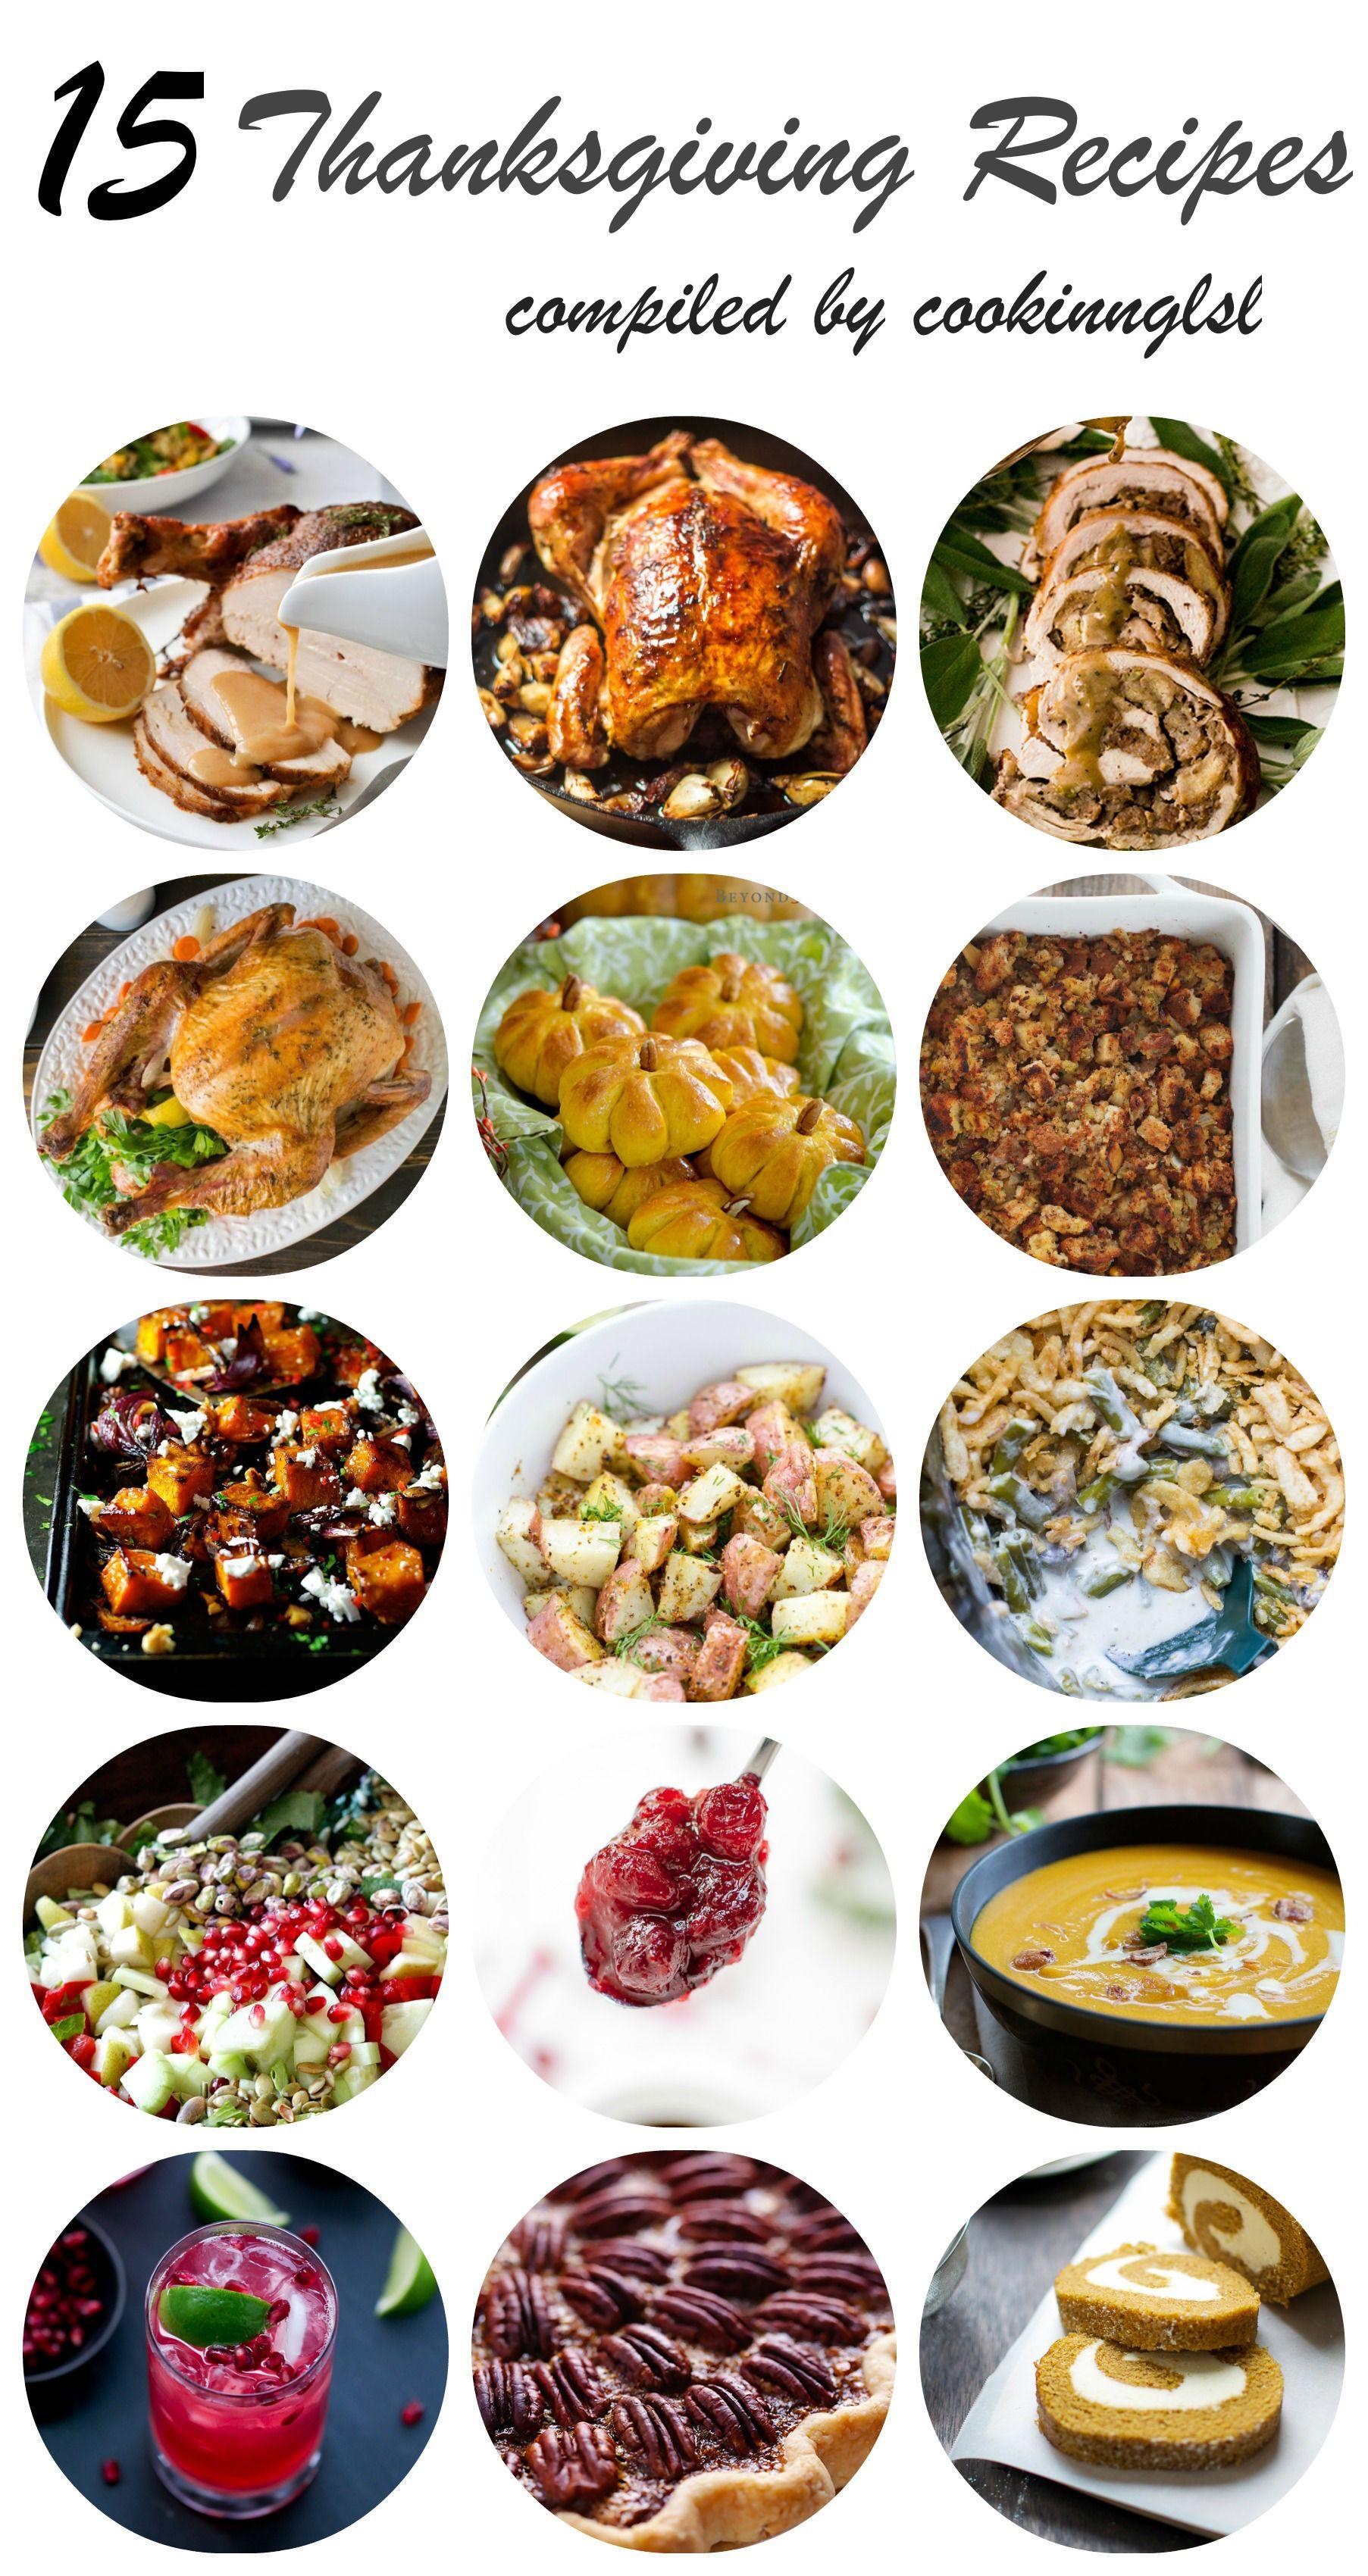 15 Thanksgiving Recipes